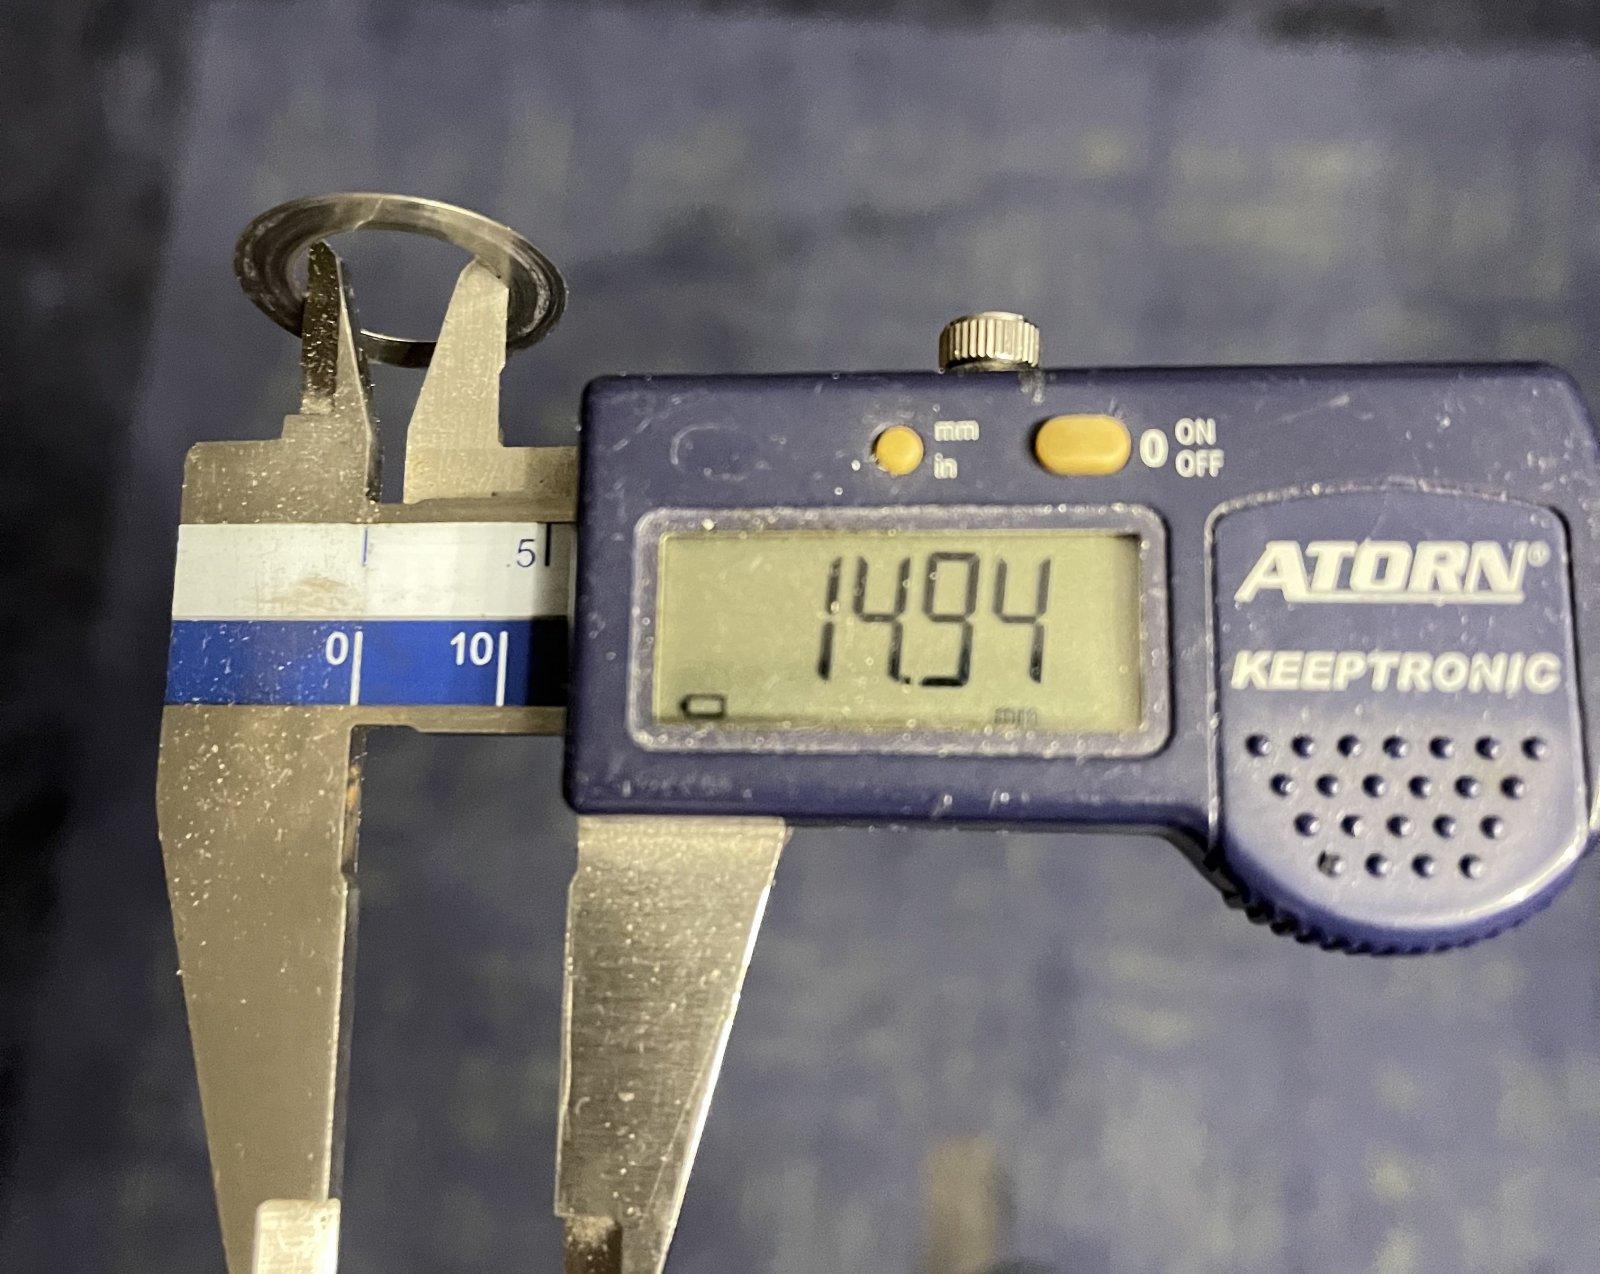 806E37DD-B909-44B2-9AFB-4D5C3021AB52.jpeg